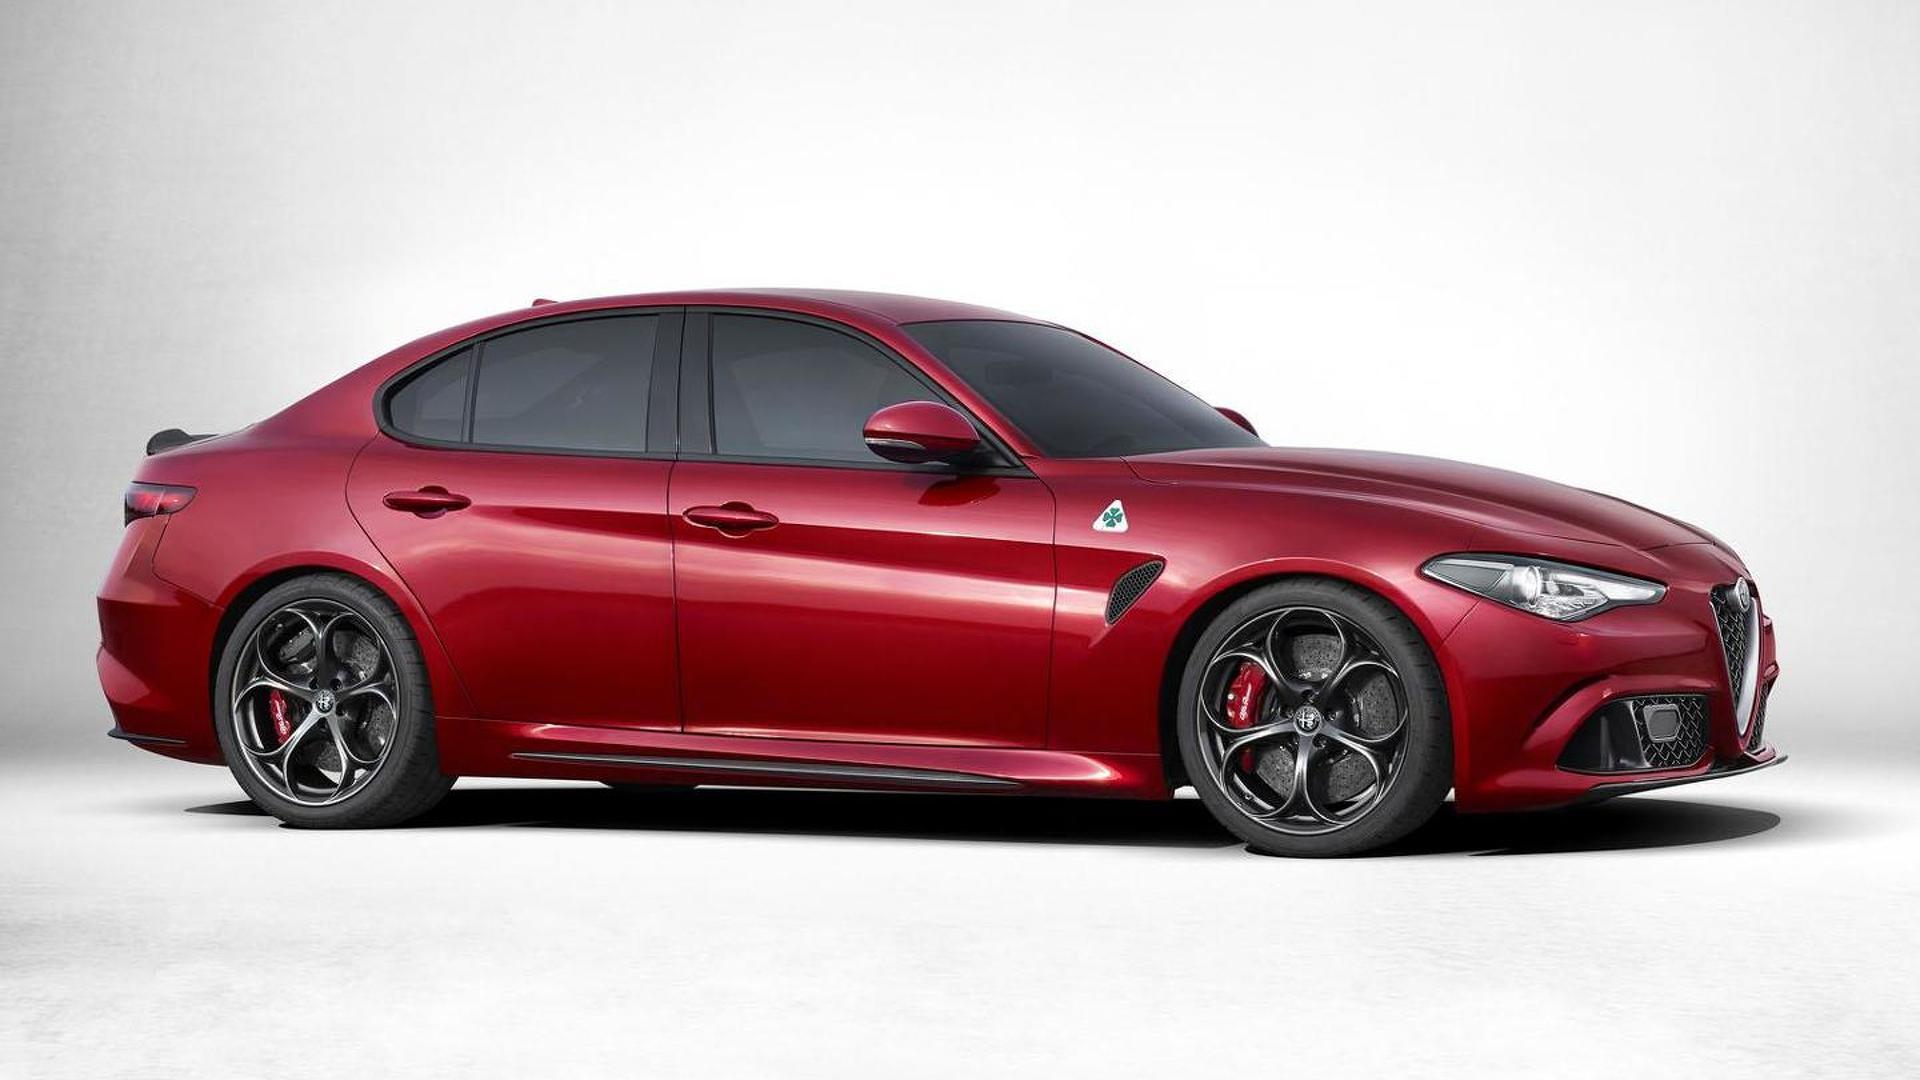 Alfa Romeo Giulia reportedly has a top speed of 321 km/h